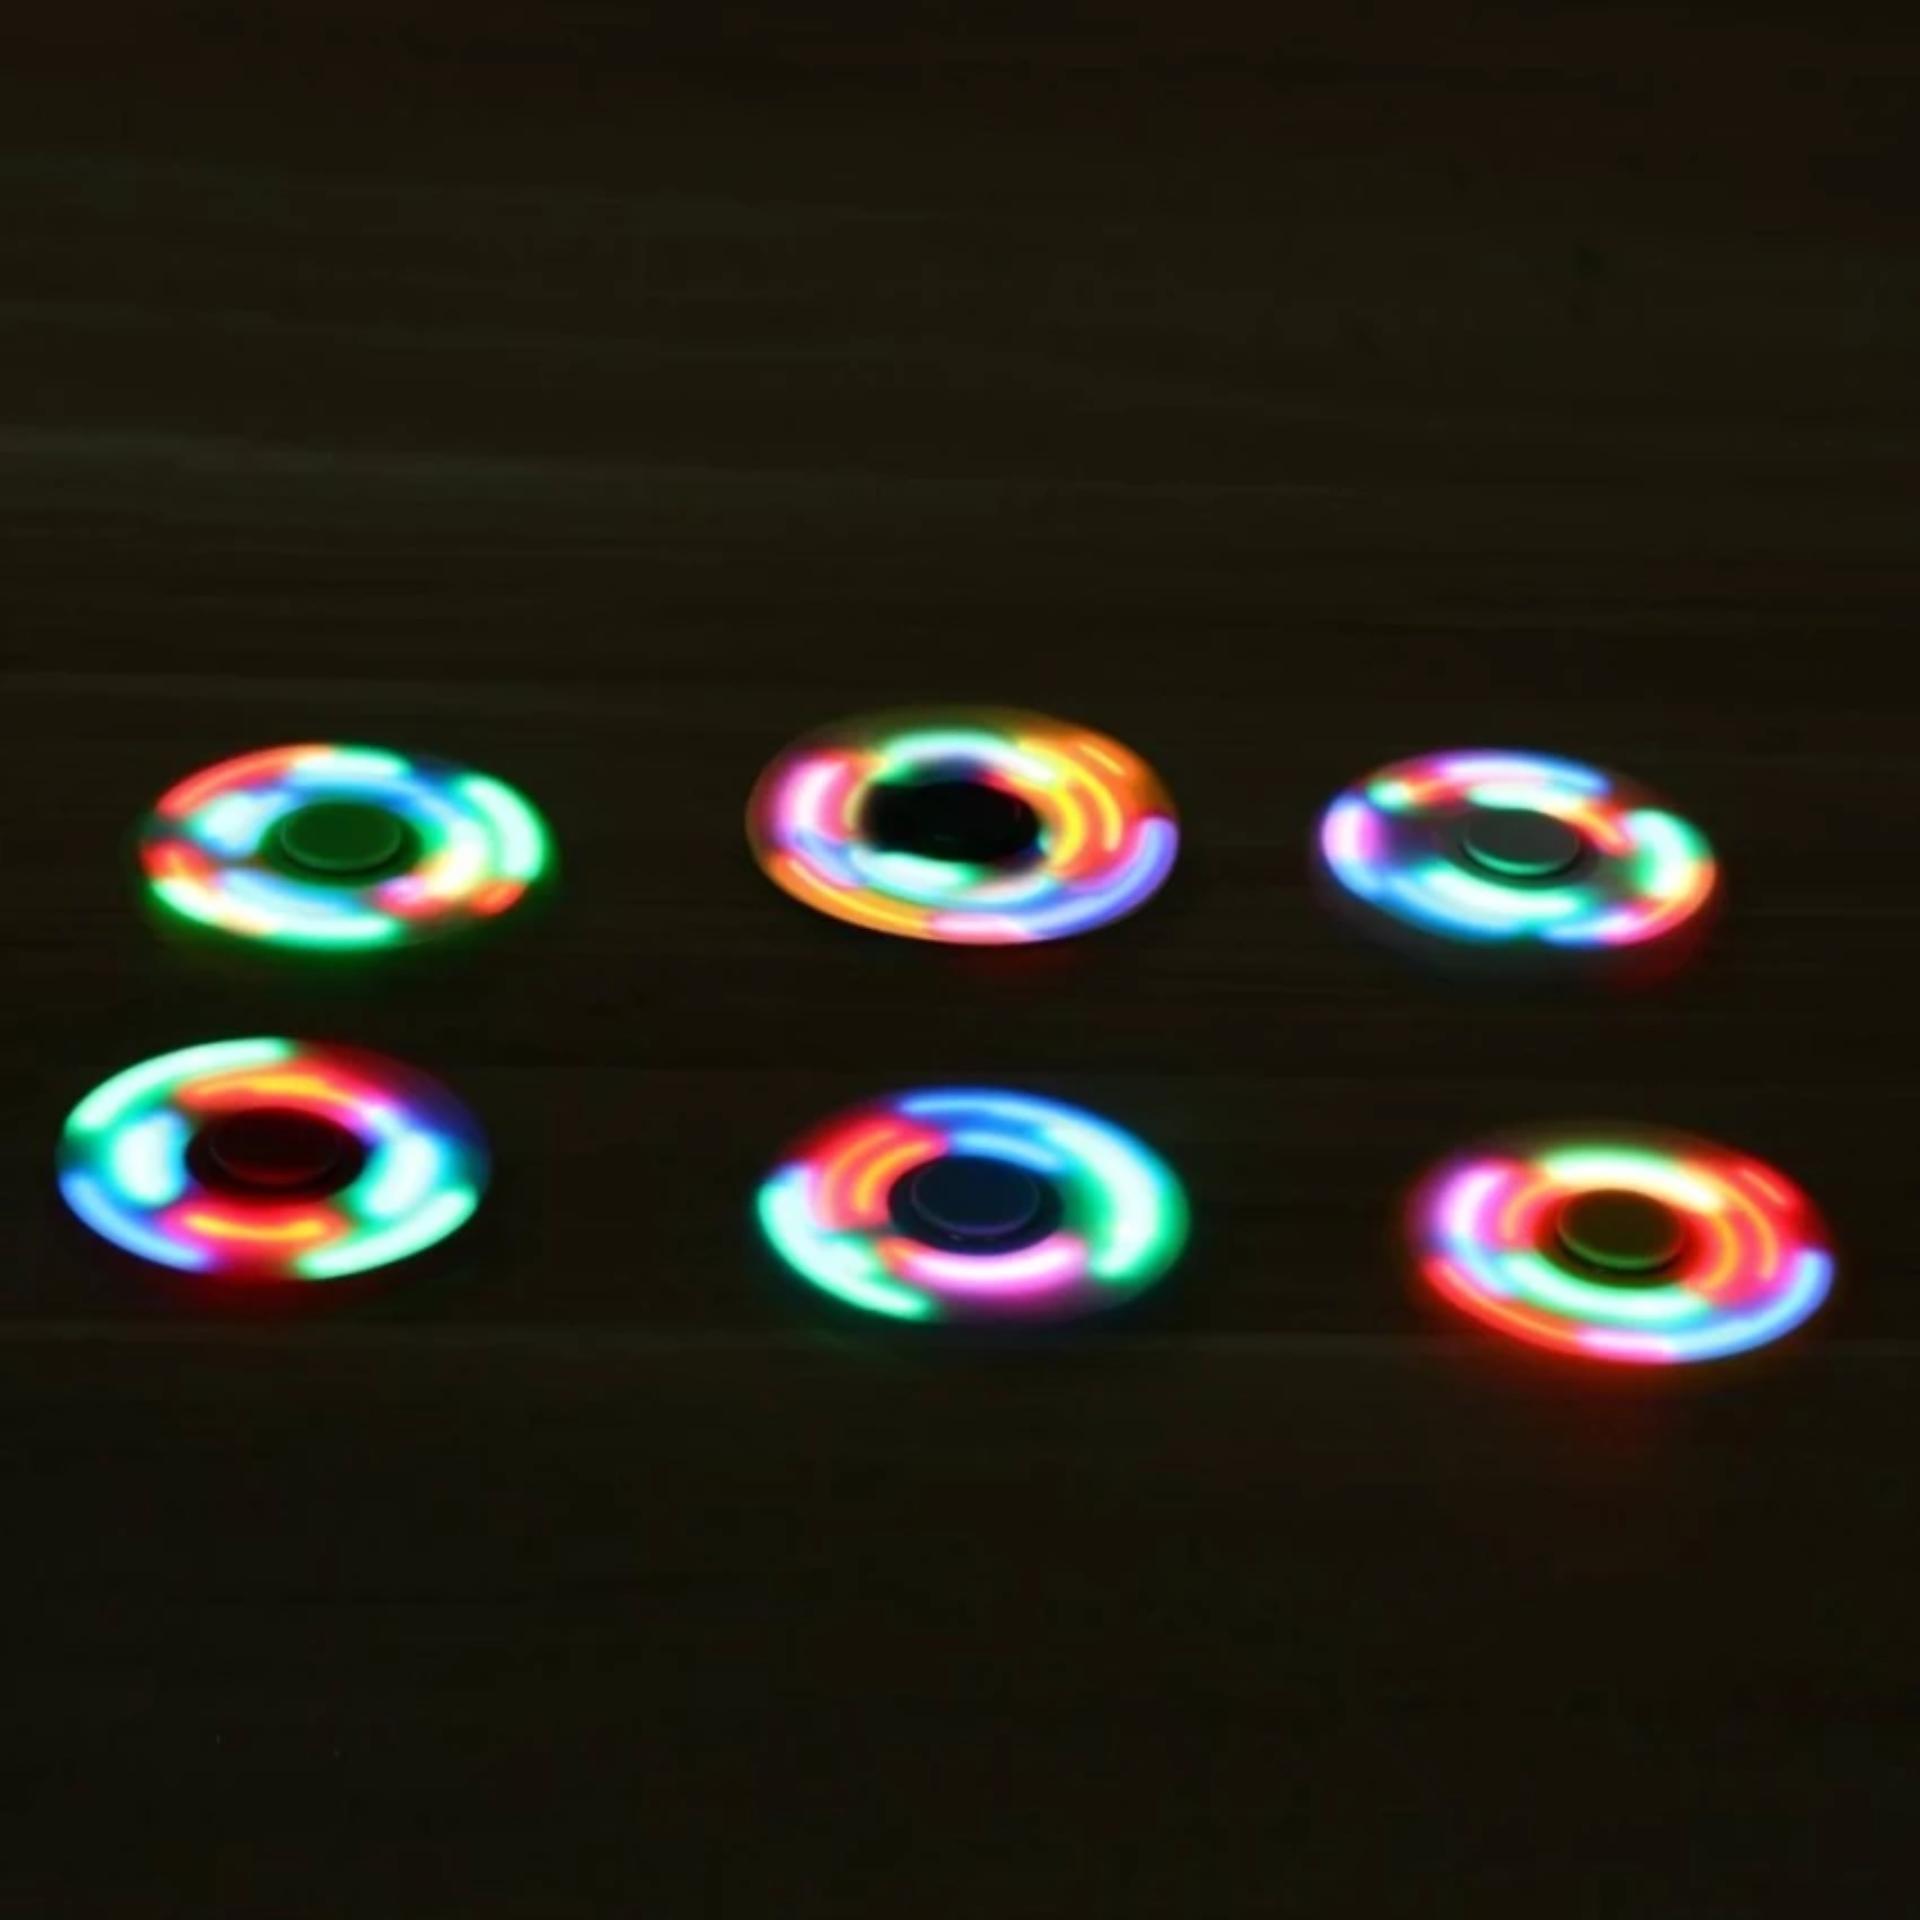 AIUEO - Fidget Spinner LED New Exotic Hand Toys Mainan Tri-Spinner .